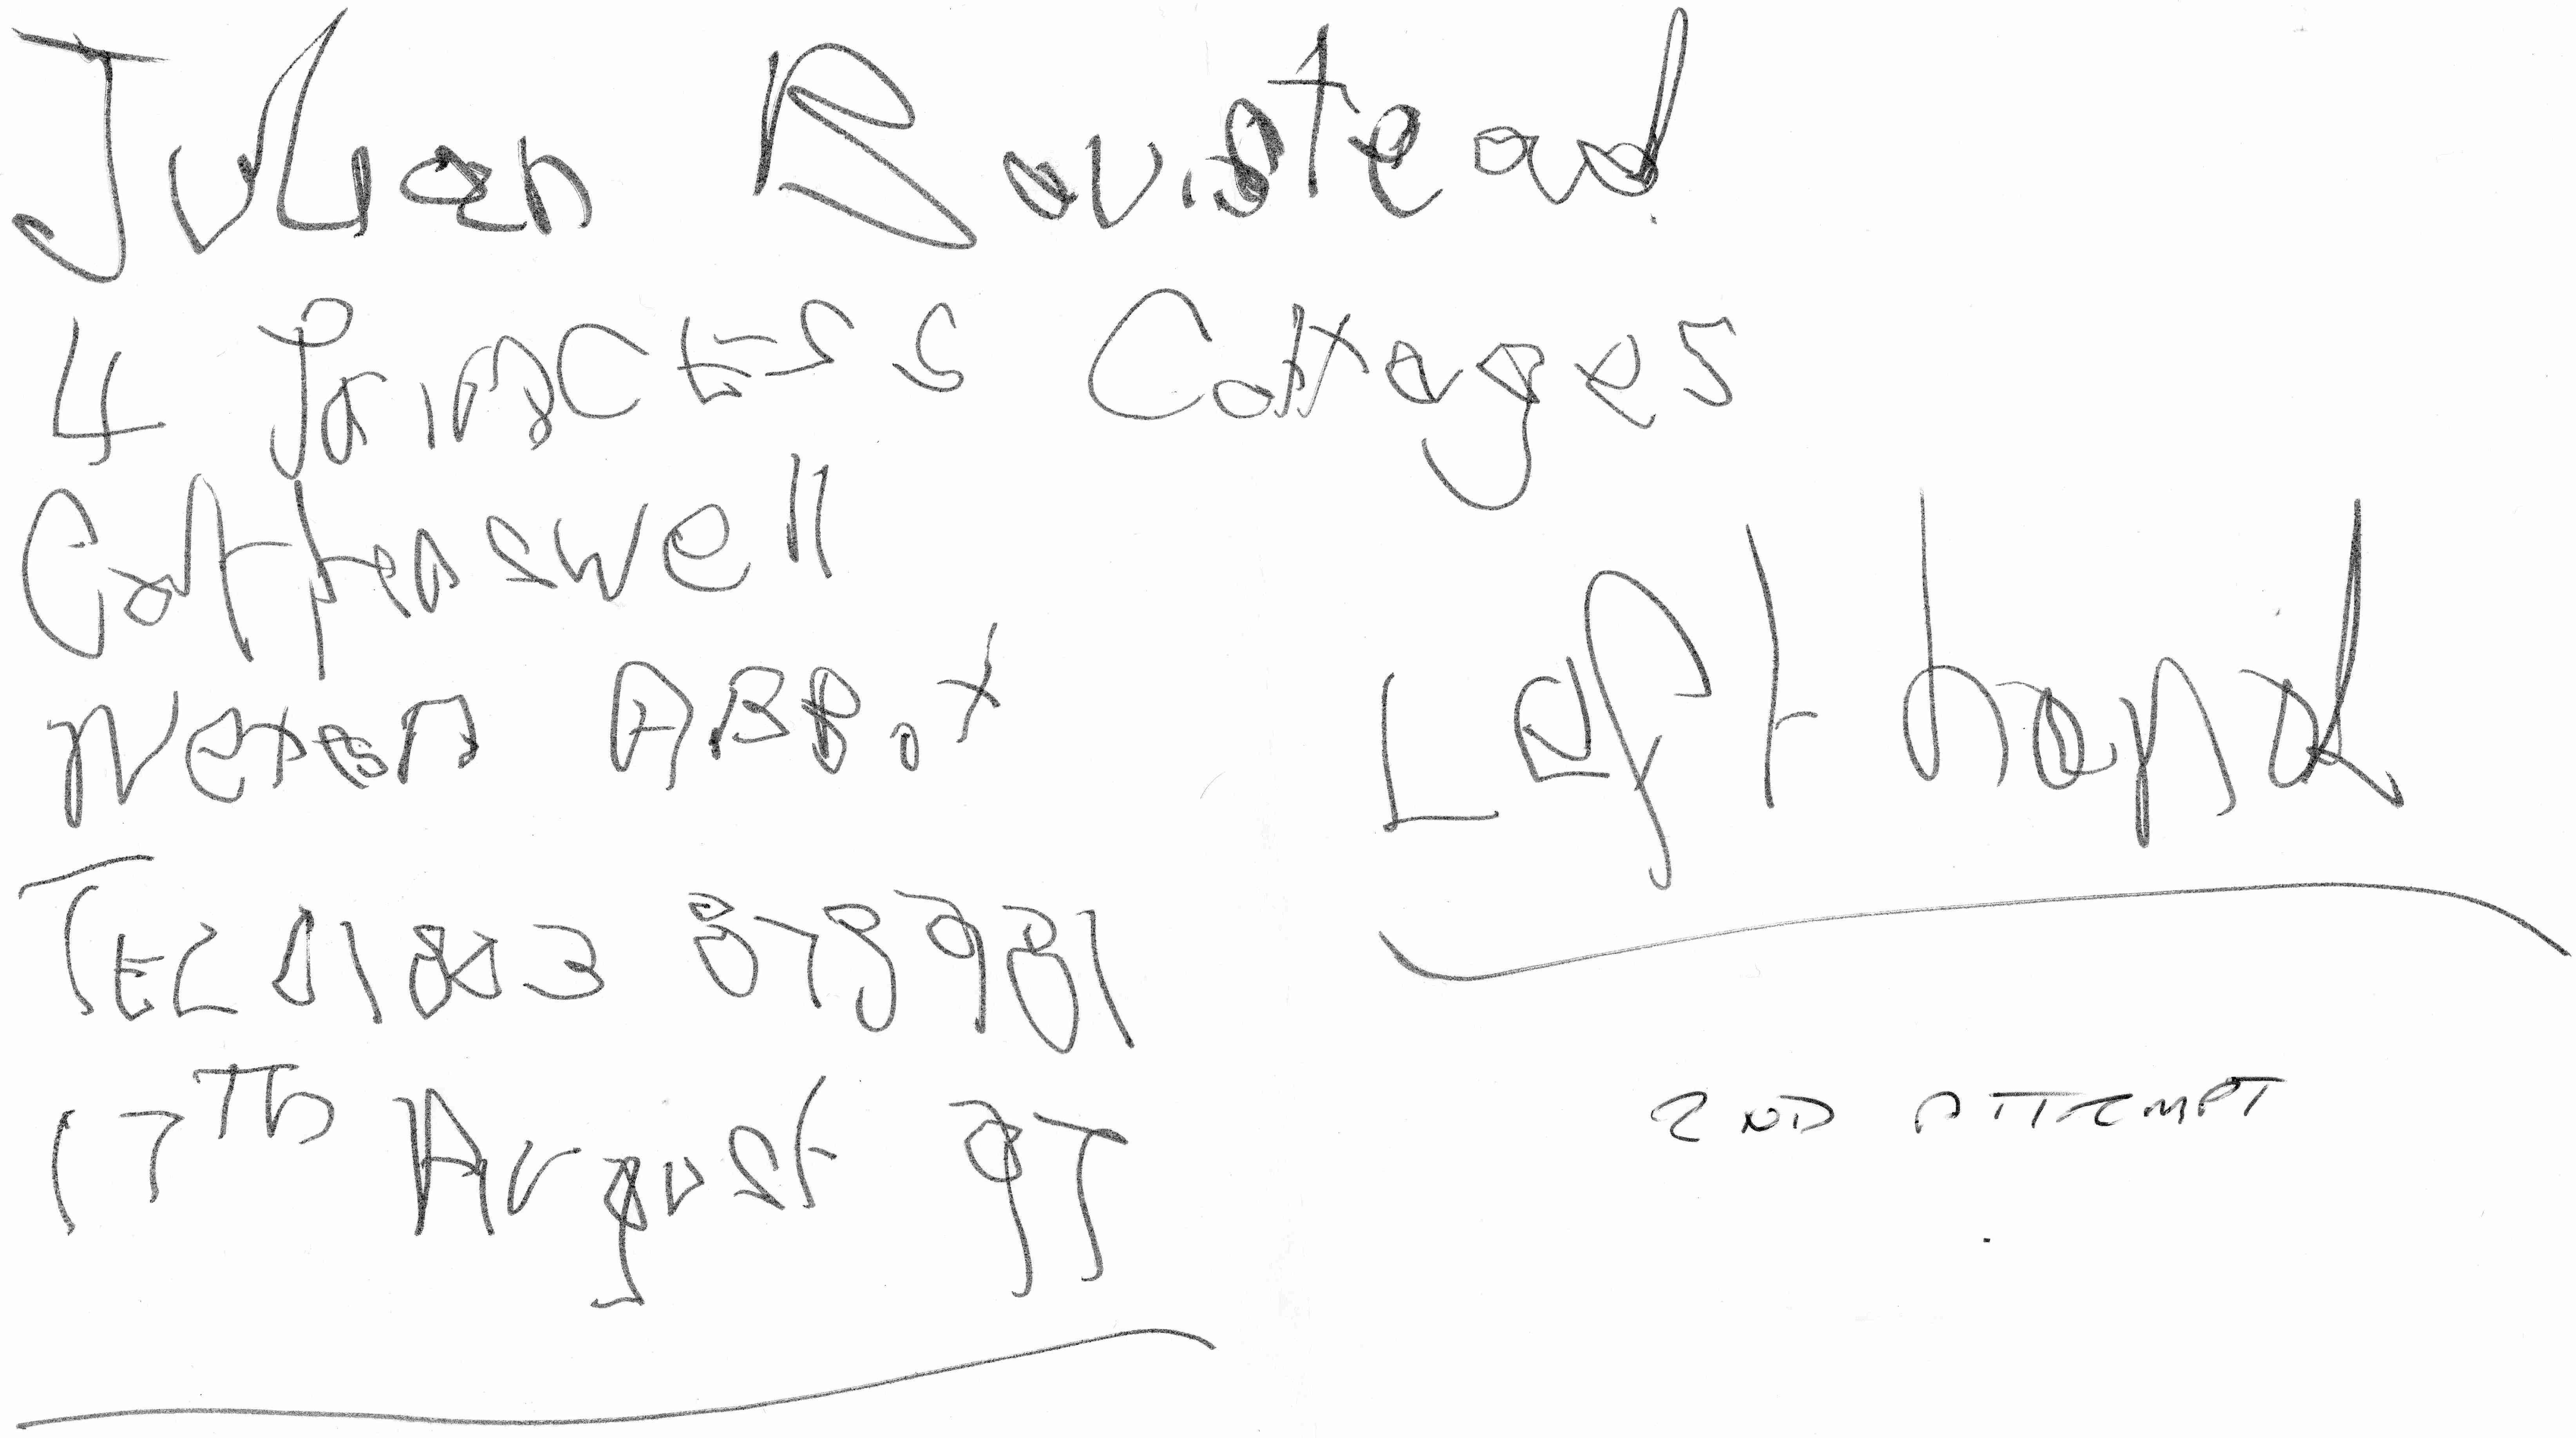 julian_C6_C7_writing_attempt_2_ibt.jpg - 616.29 kB